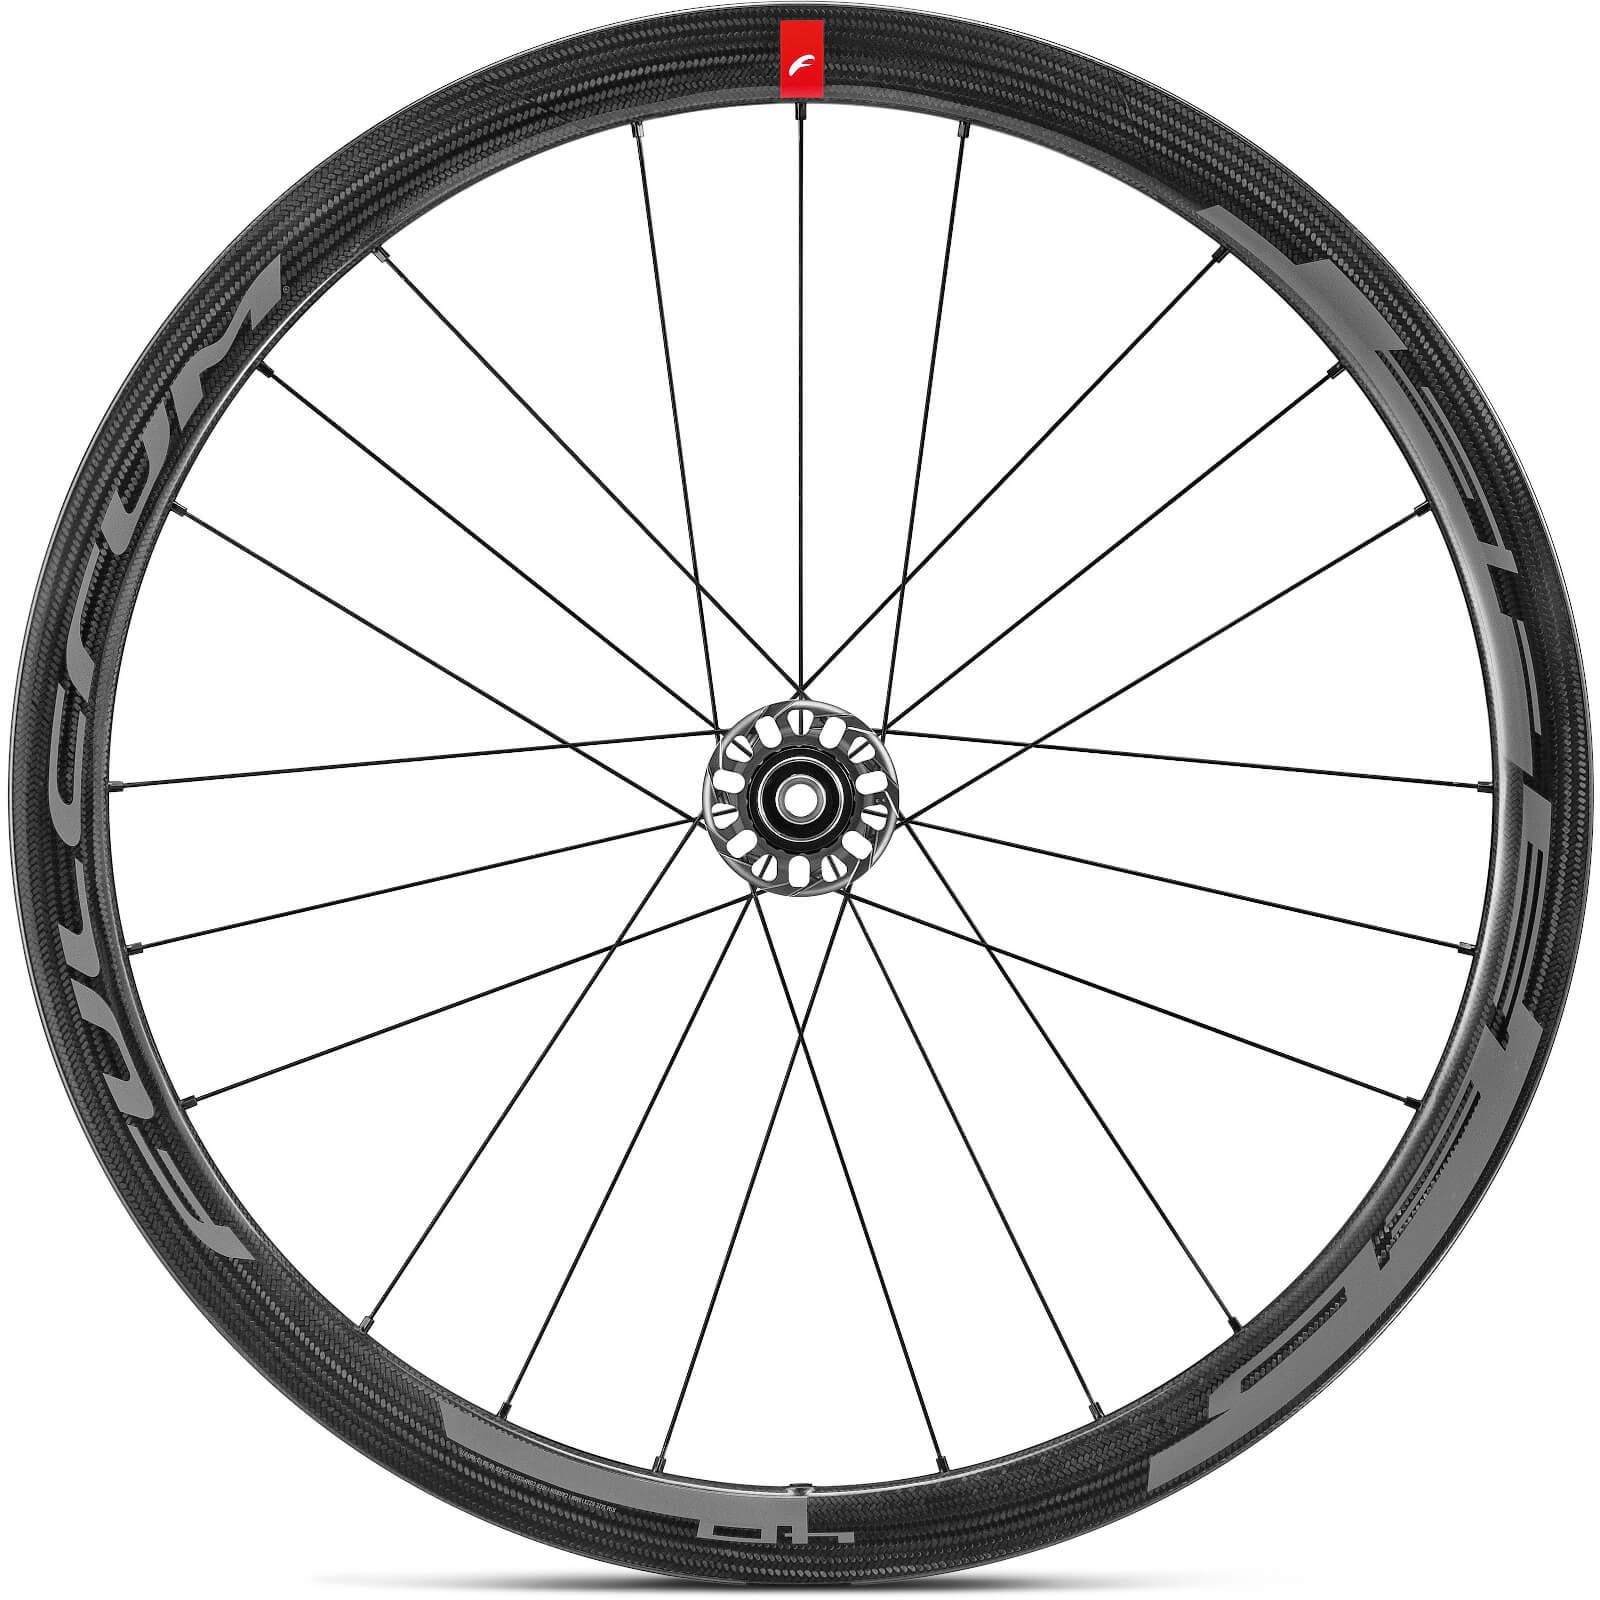 Fulcrum Speed 40 Disc Brake Carbon Clincher Wheelset - Shimano/SRAM